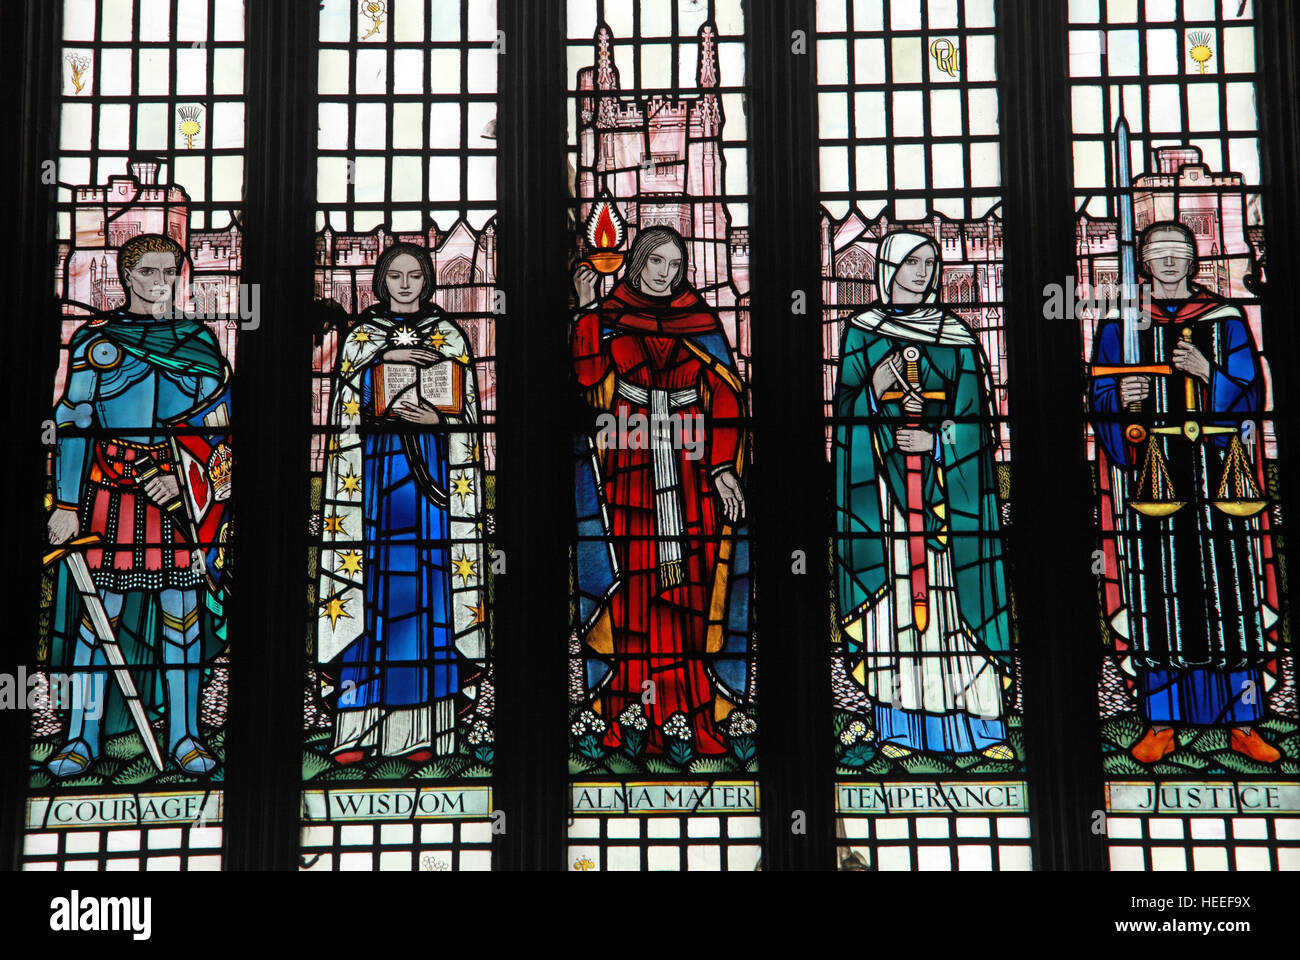 Queens University Belfast Halls Stained Glass WindowNorthern IrelandUK